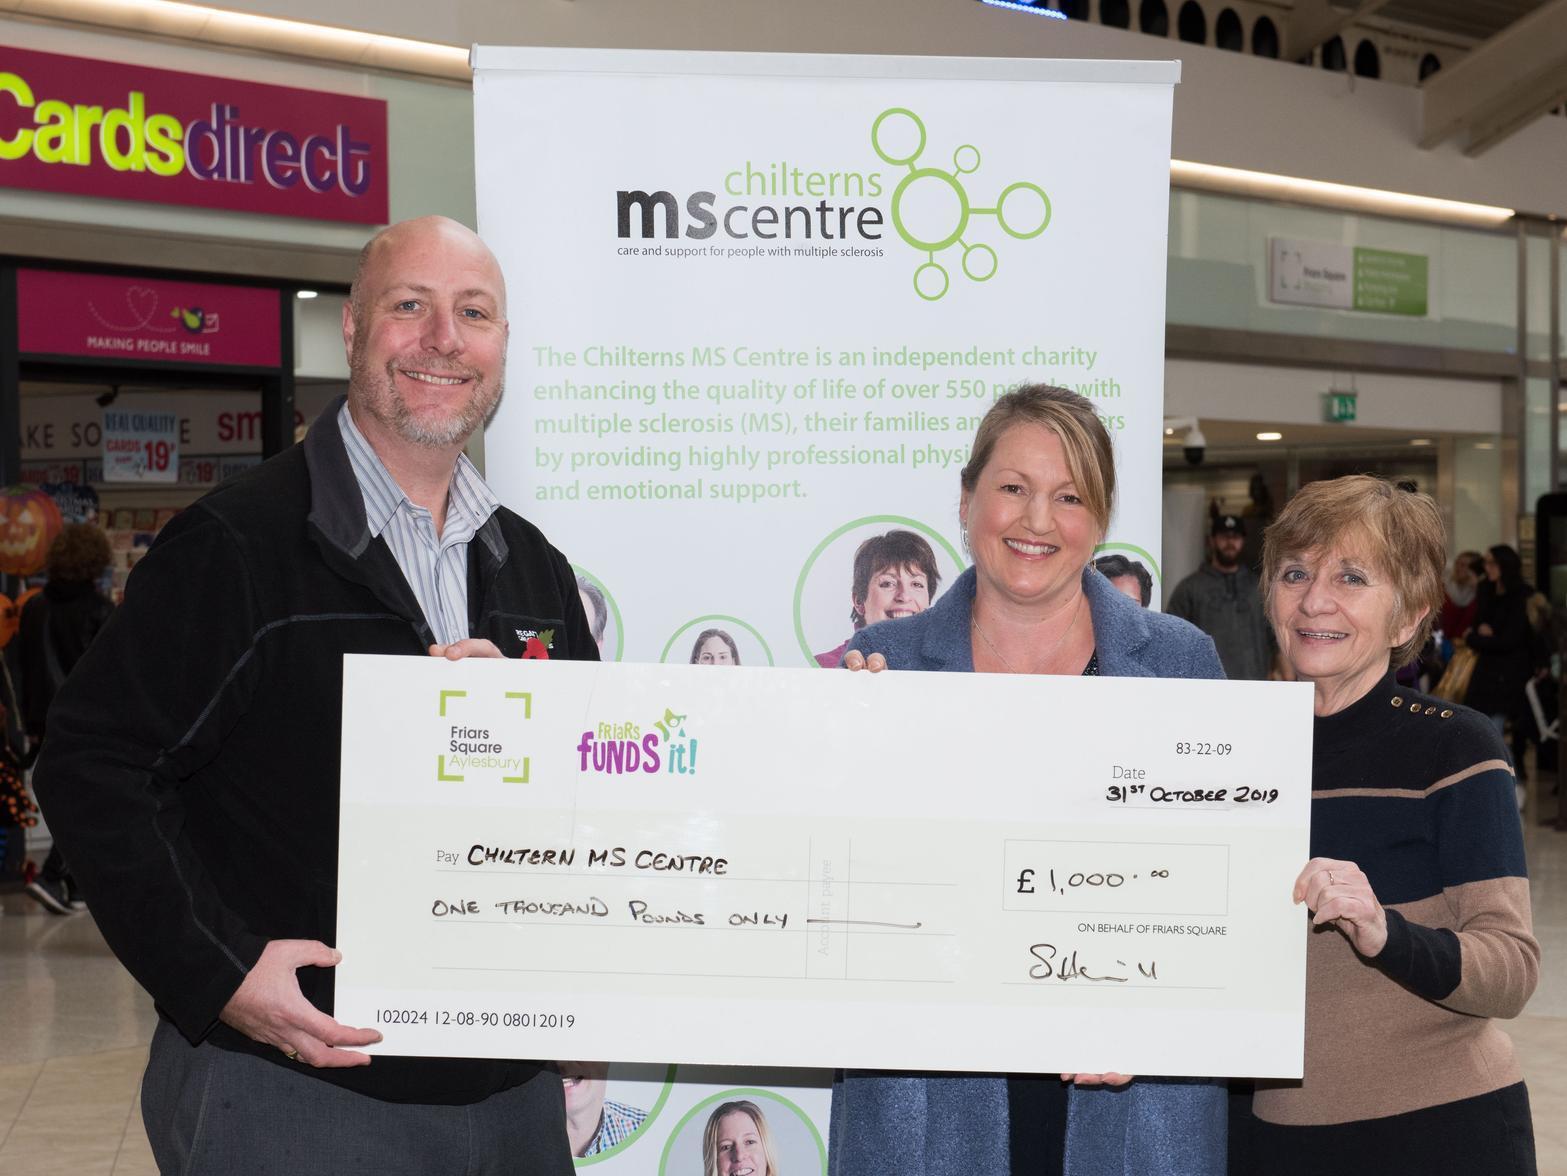 Friars Square donates £2,500 to worthy causes across Aylesbury Vale - Bucks Herald